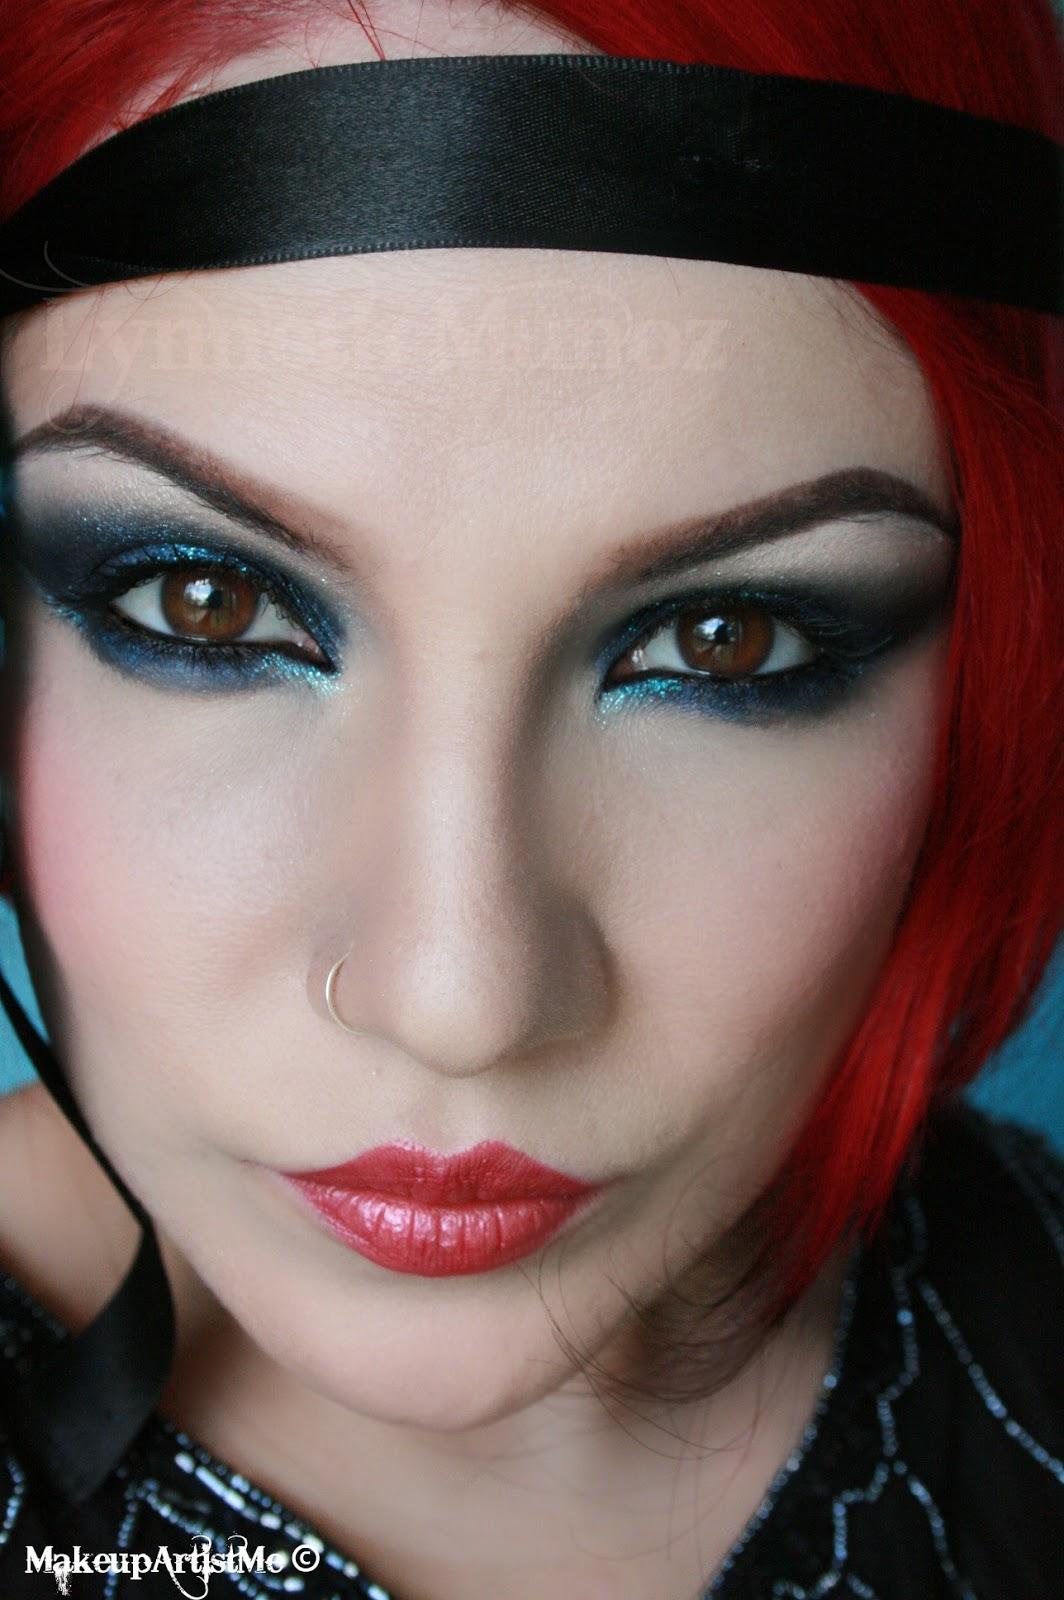 Make Up Artist Me 1920s Dramatic Makeup Look